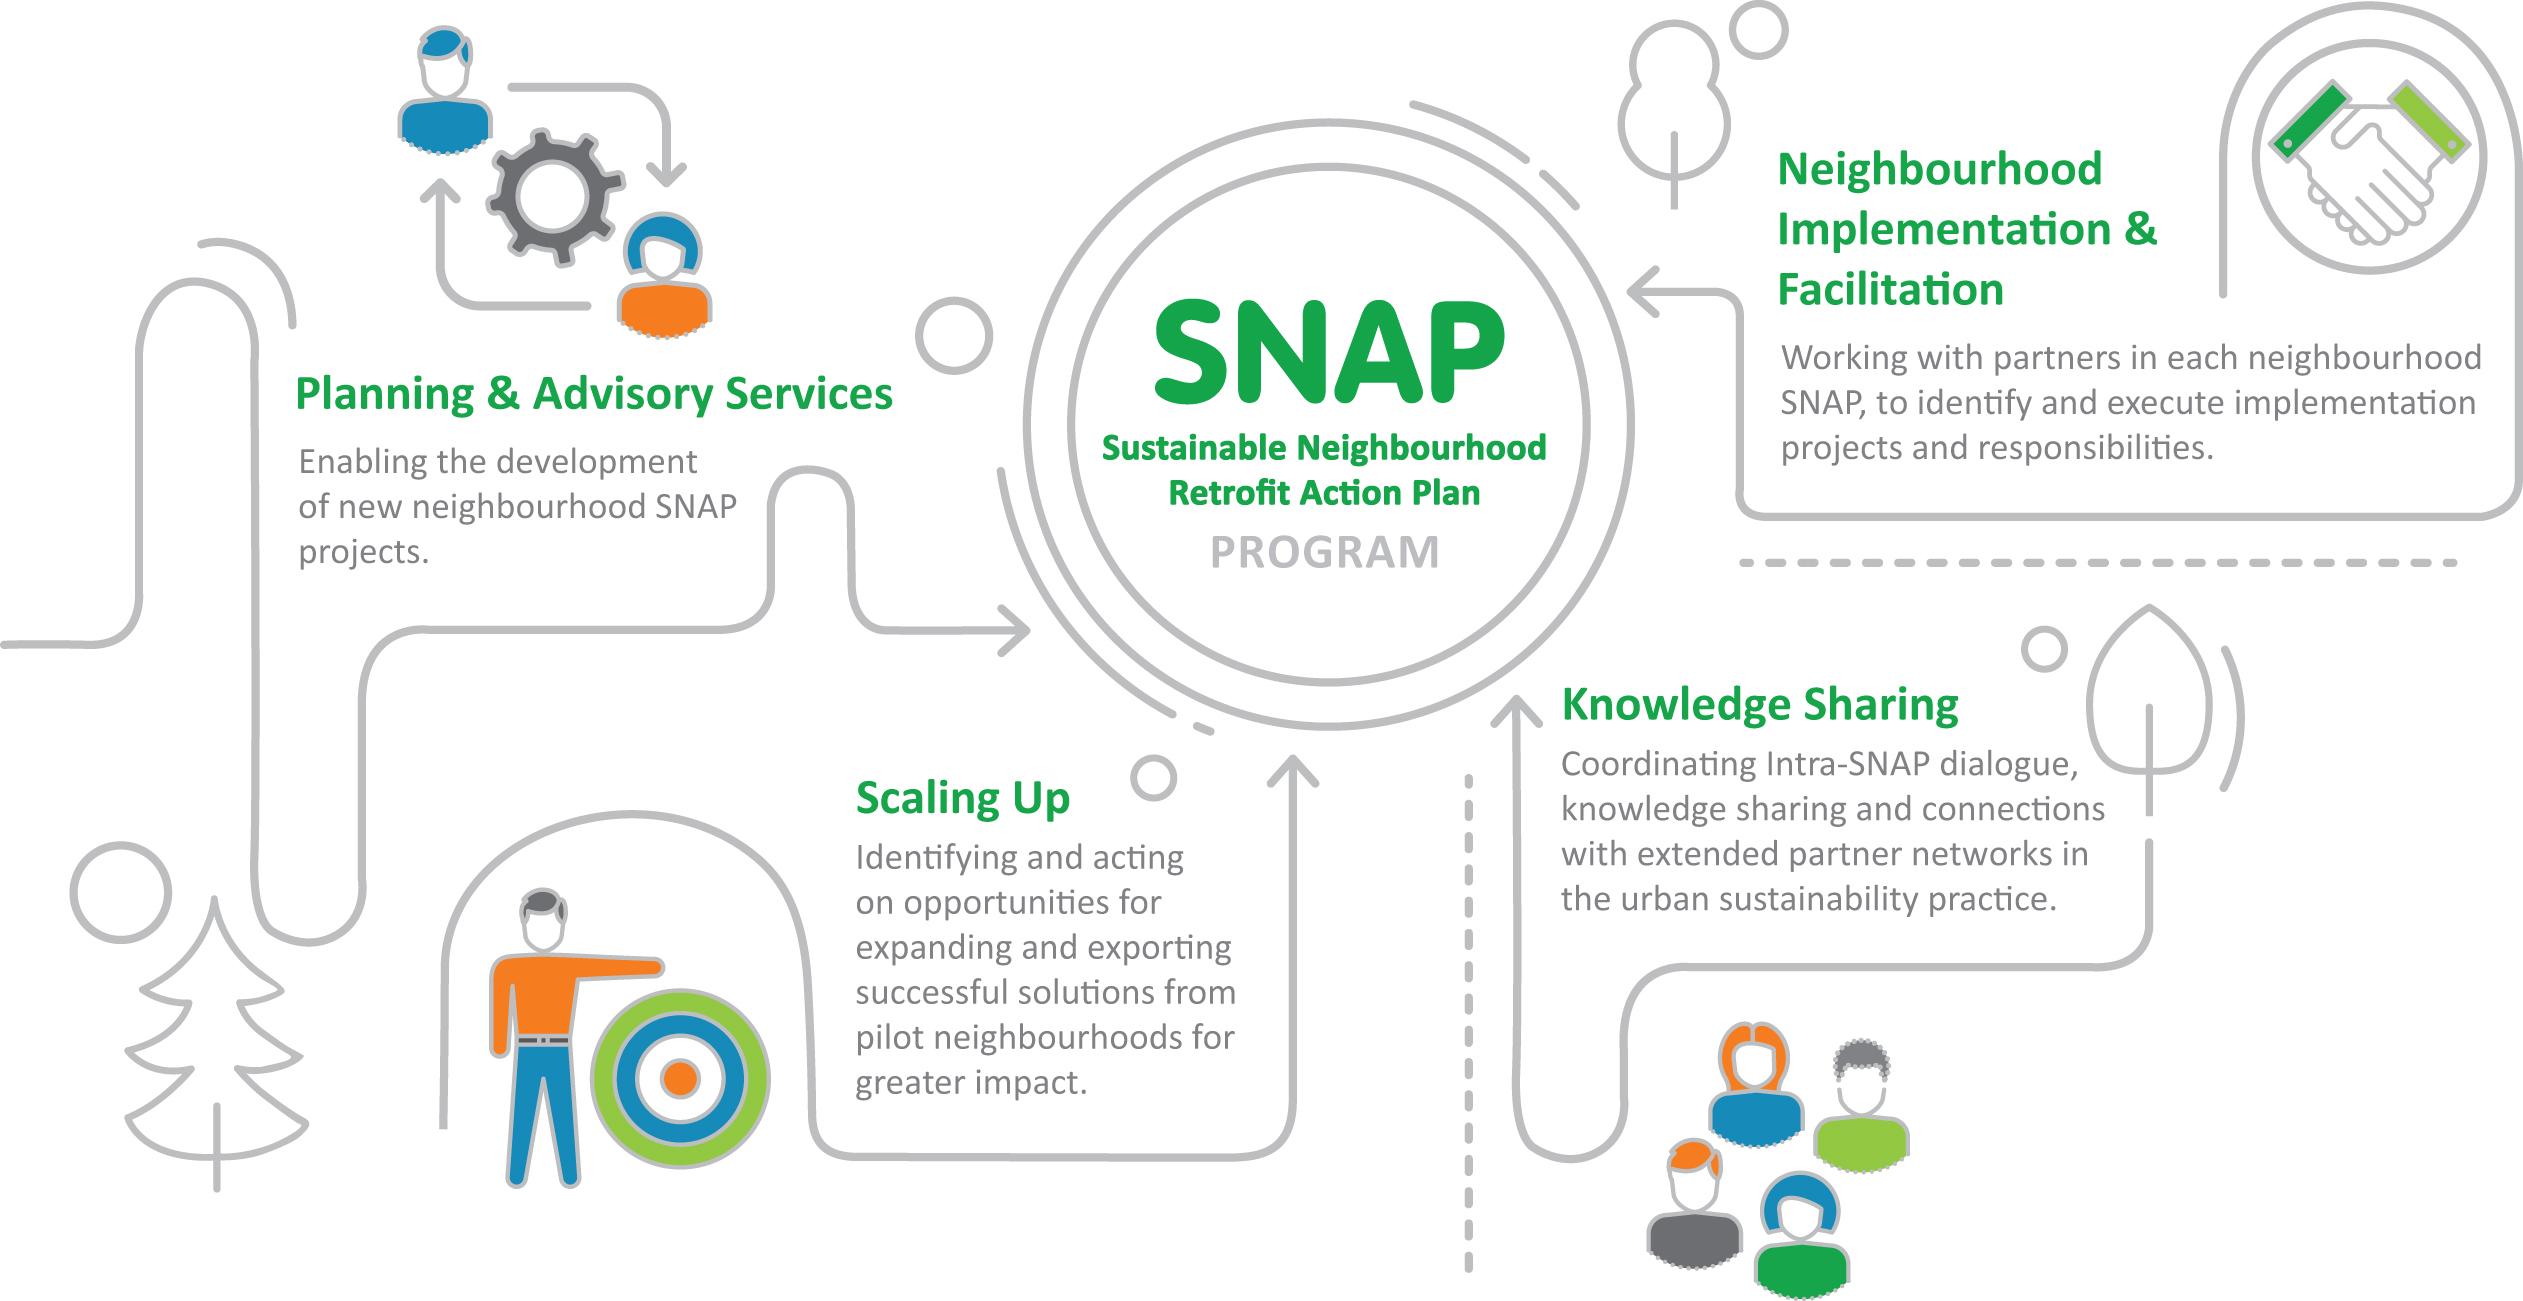 SNAP program diagram